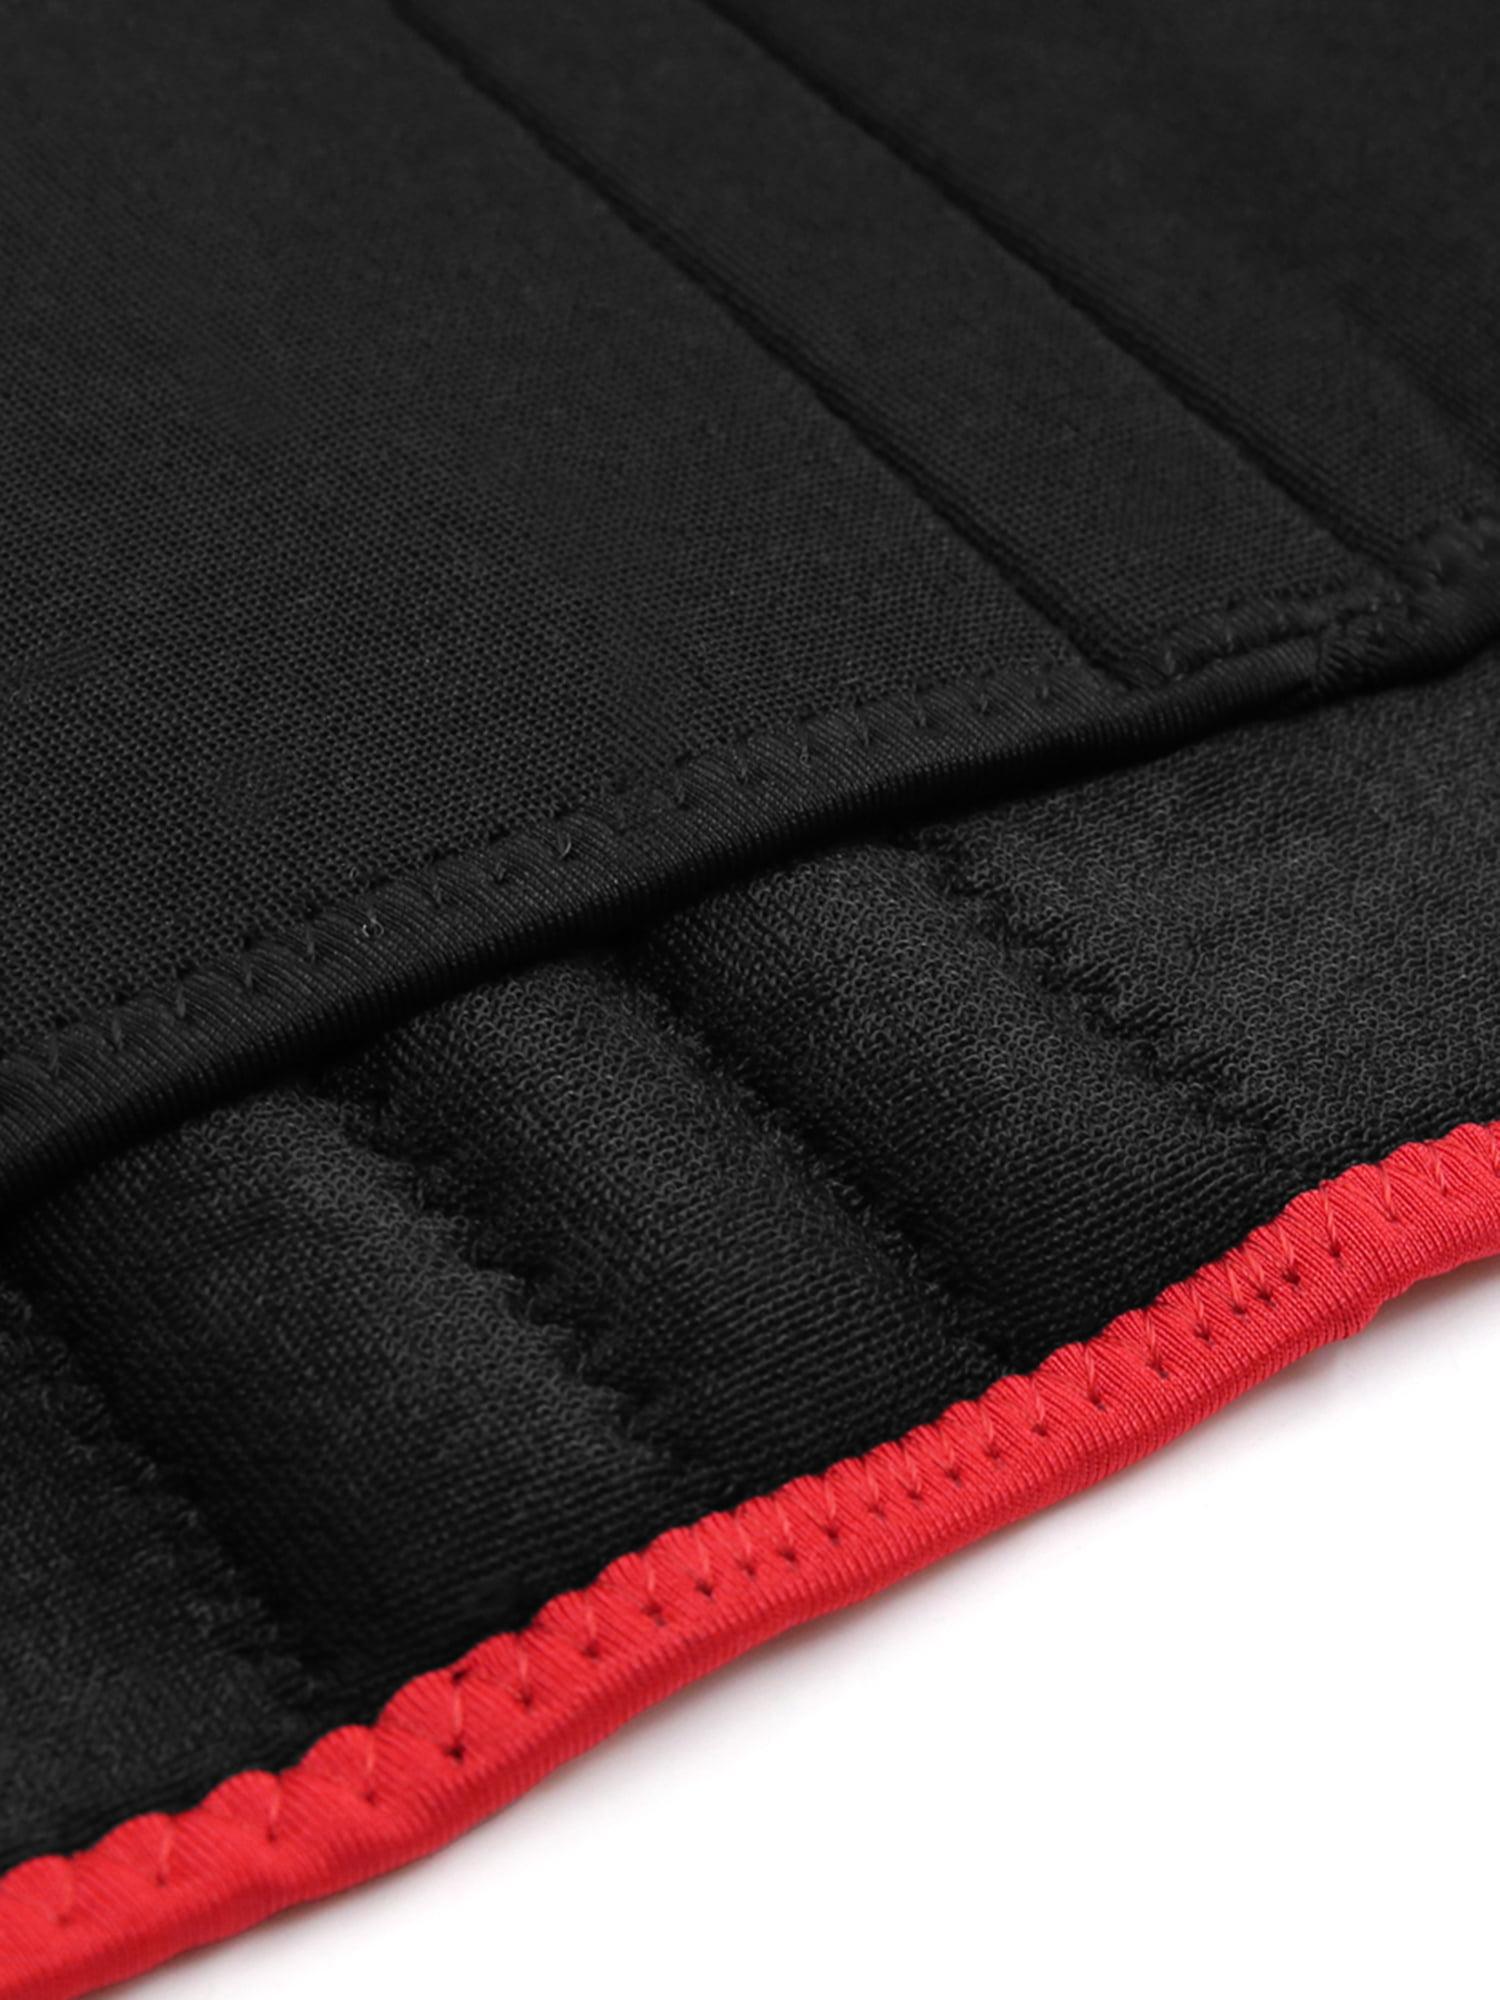 5184012bd7f60 Black L Size Unisex Adjustable Waist Tighten Band Body Shaper Care Shapewear